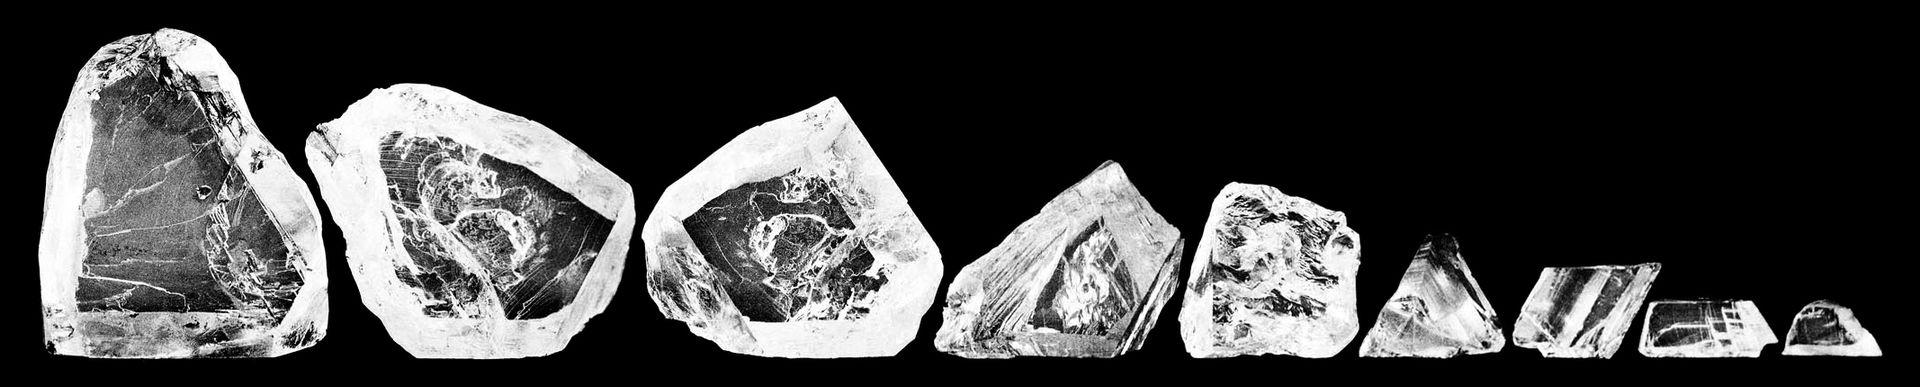 De nio största diamanterna från The Cullinan innan de slipades. Bild Wiki Commons.